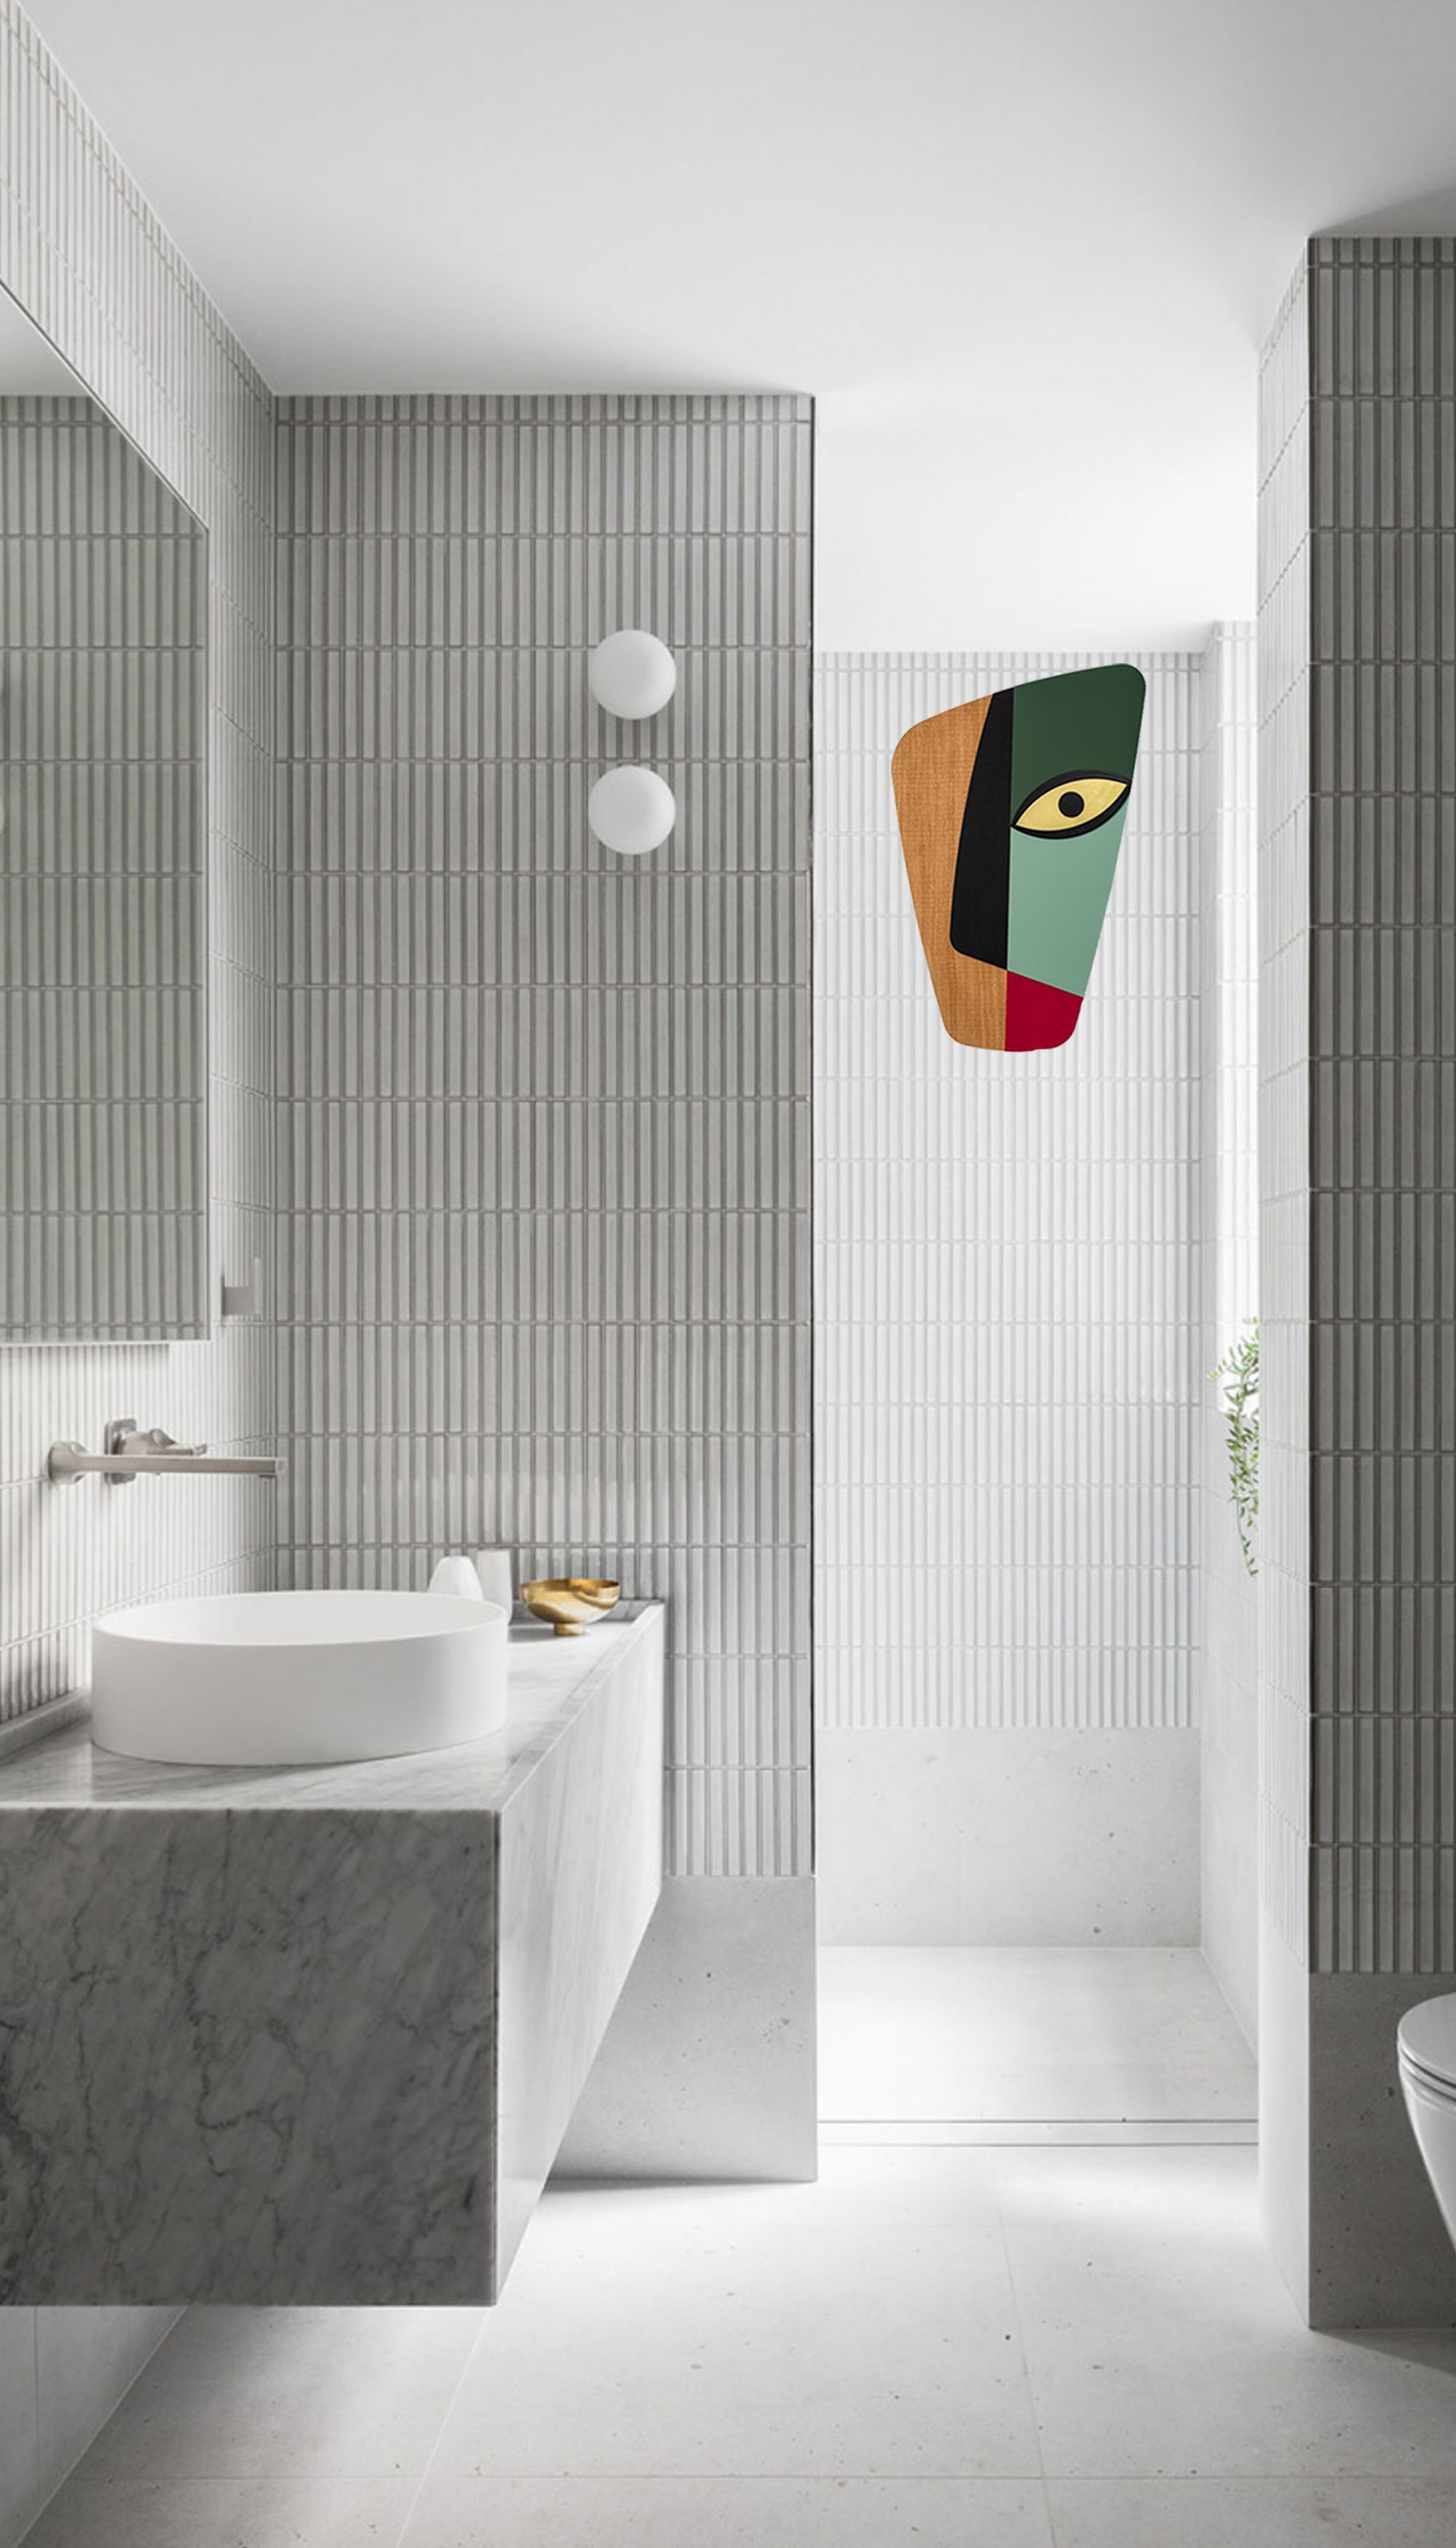 bathroom design wall decor bathroom design condominium on bathroom wall decor id=71829